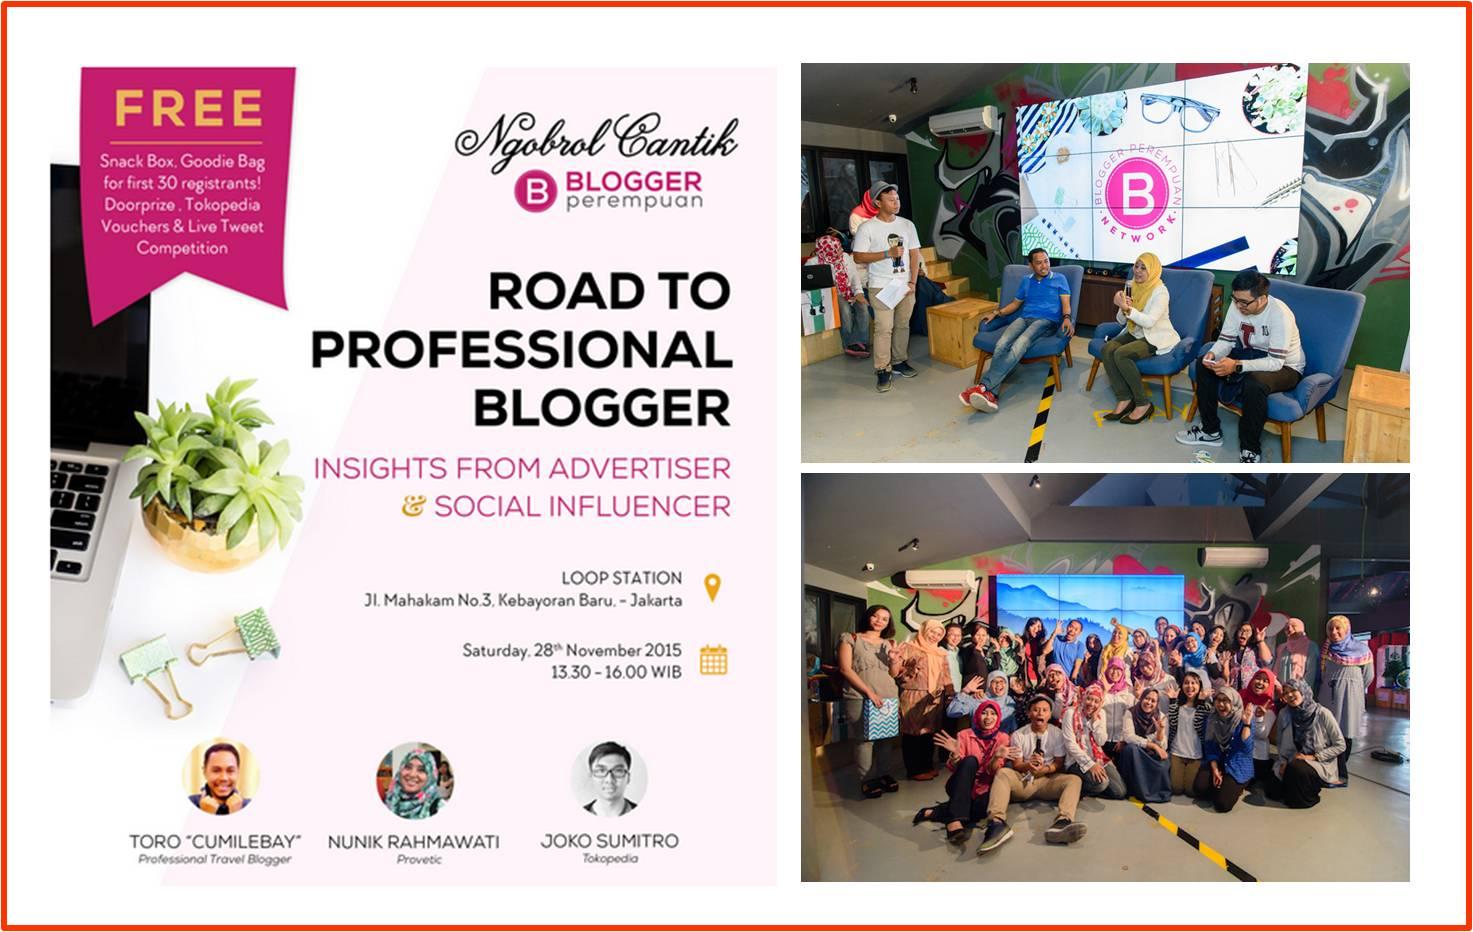 Ngobrol Cantik Road To Prefisional Bloger